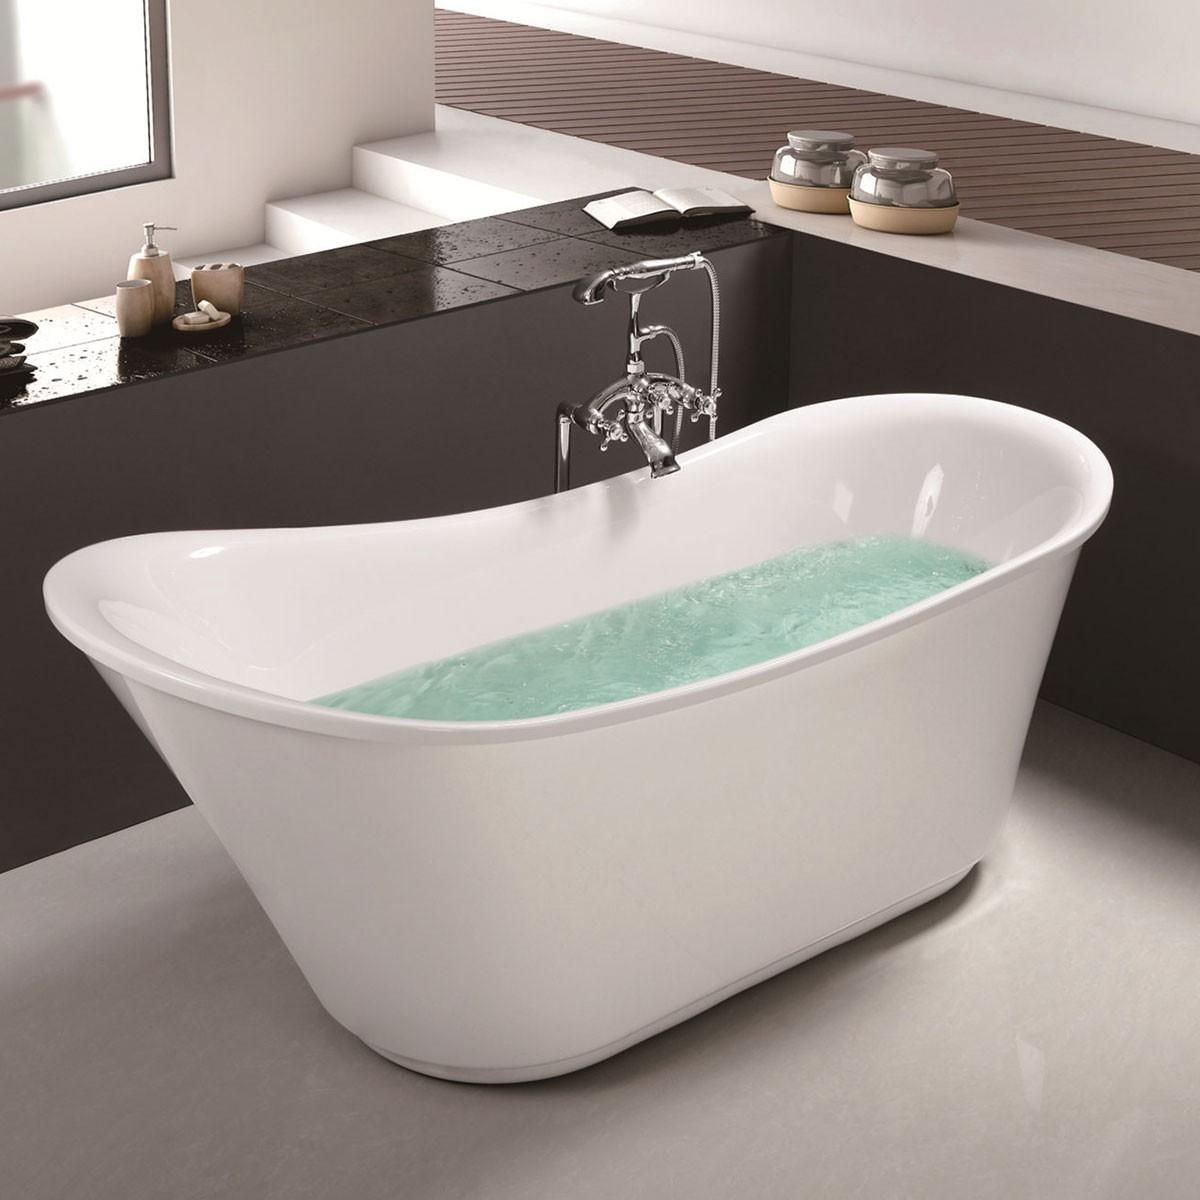 71 In Acrylic White Freestanding Bathtub (DK-MEC3003)